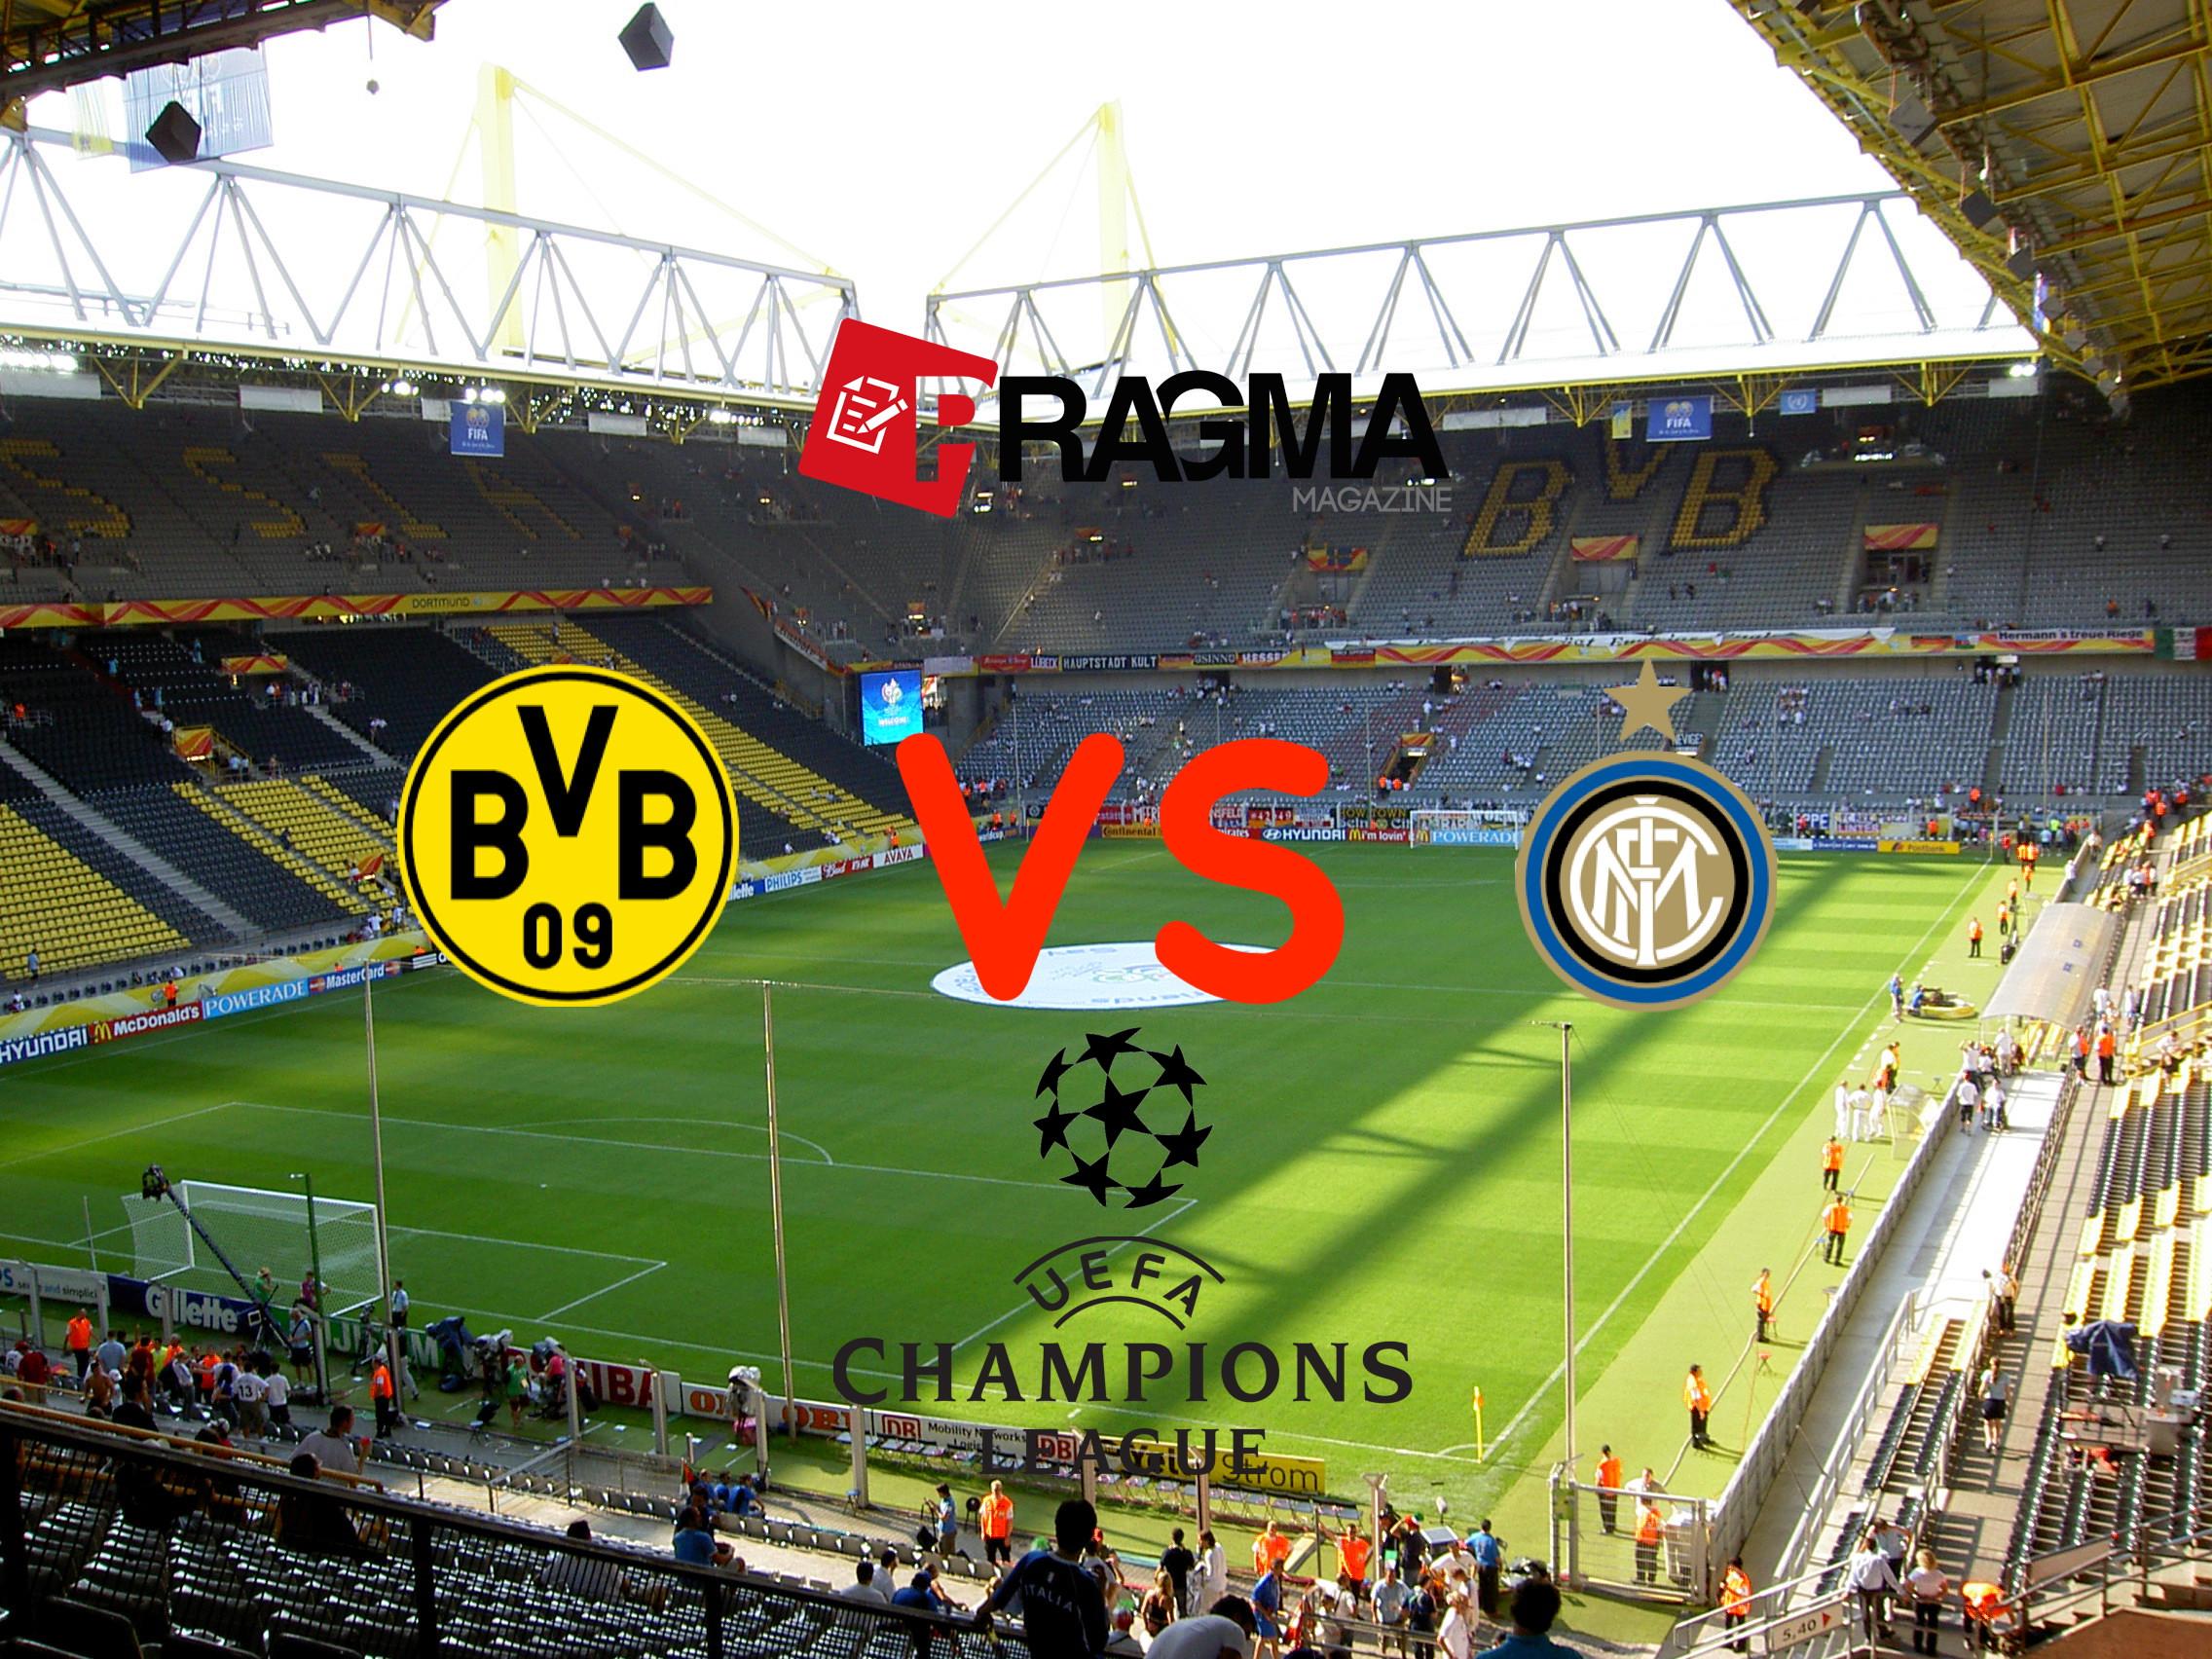 Borussia Dortmund - Inter